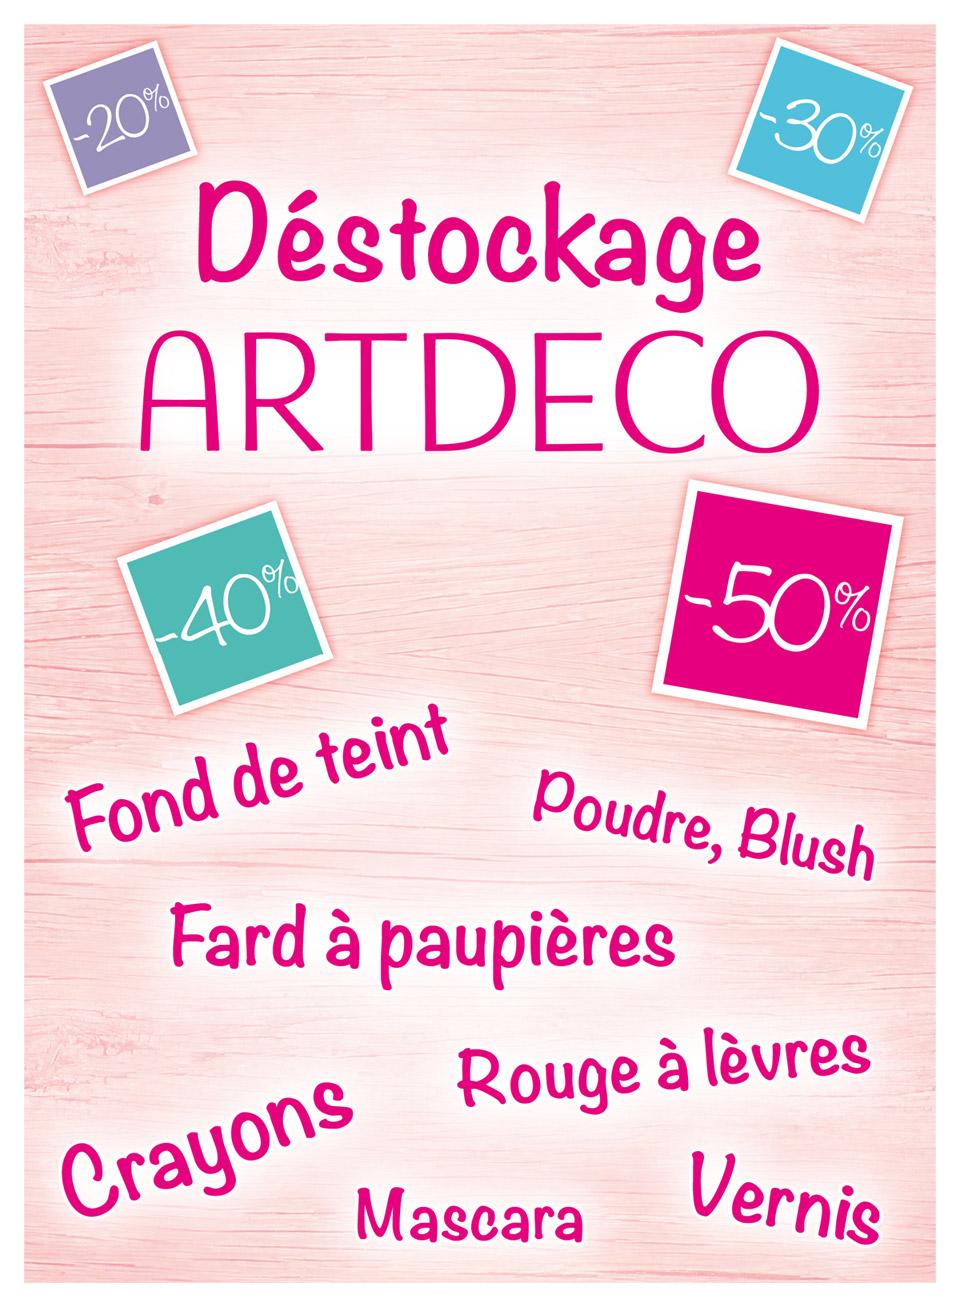 Desotckage ARTDECO